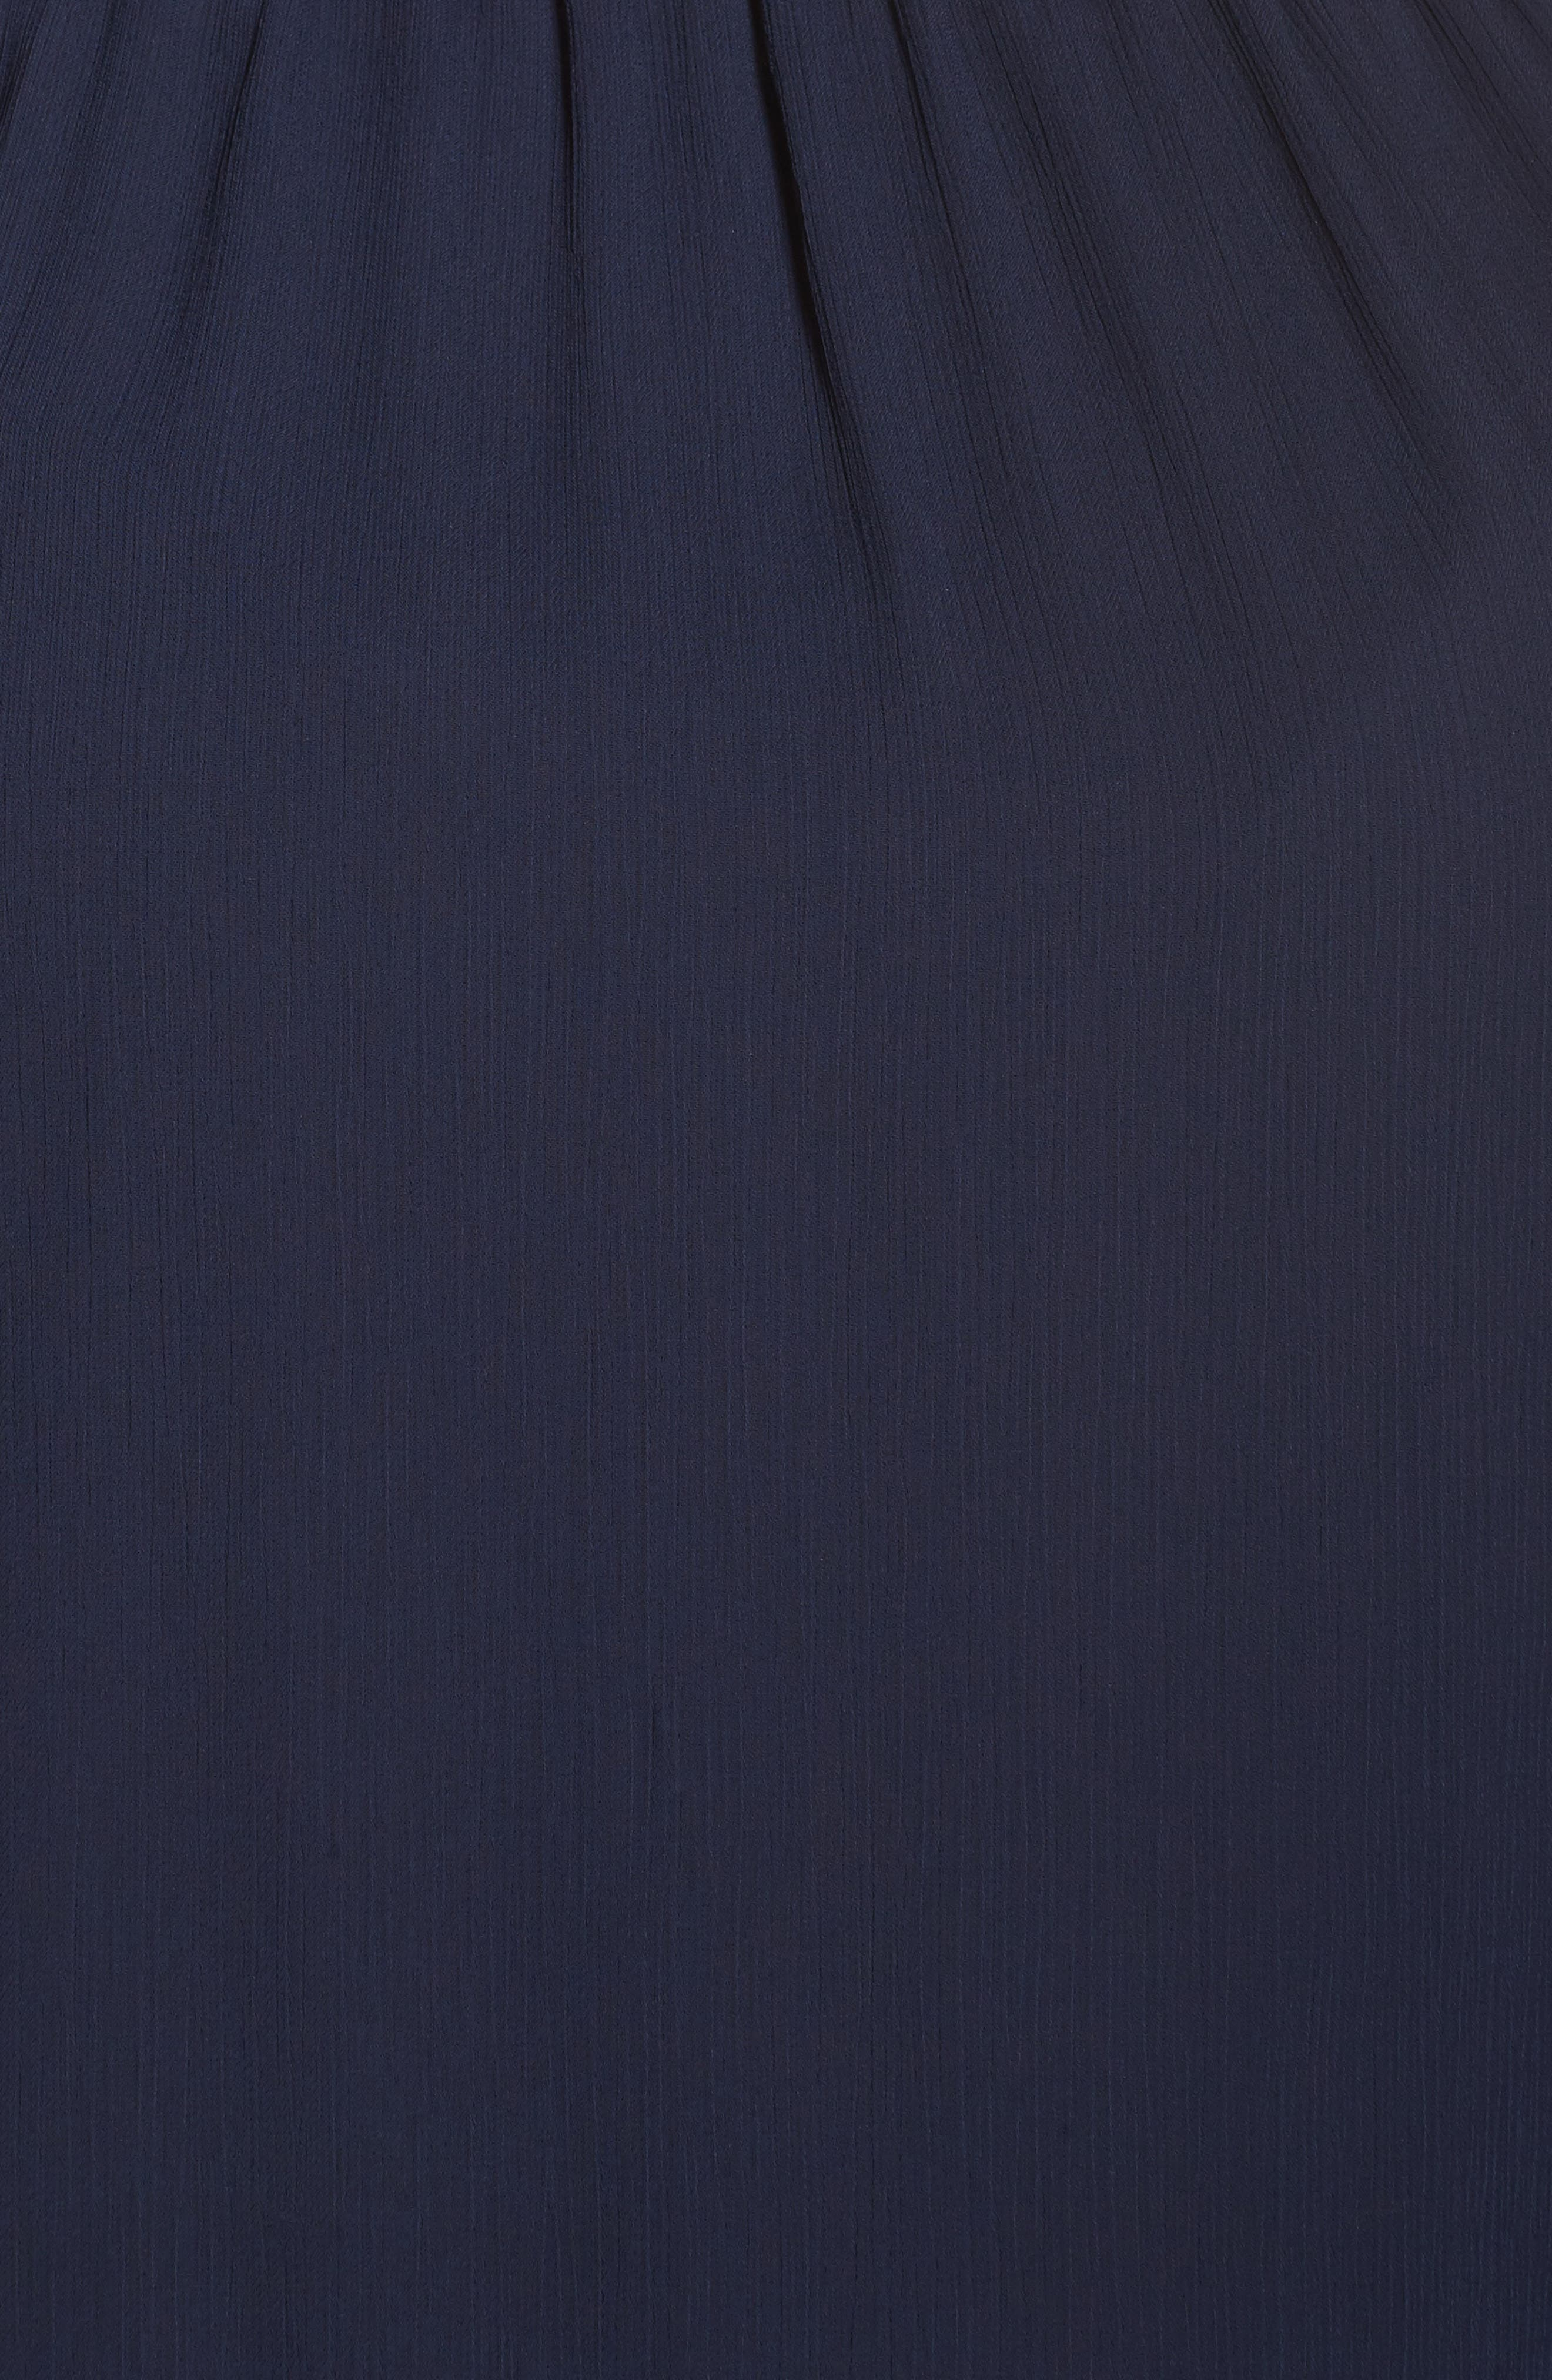 Lace Trim Babydoll Top,                             Alternate thumbnail 5, color,                             401